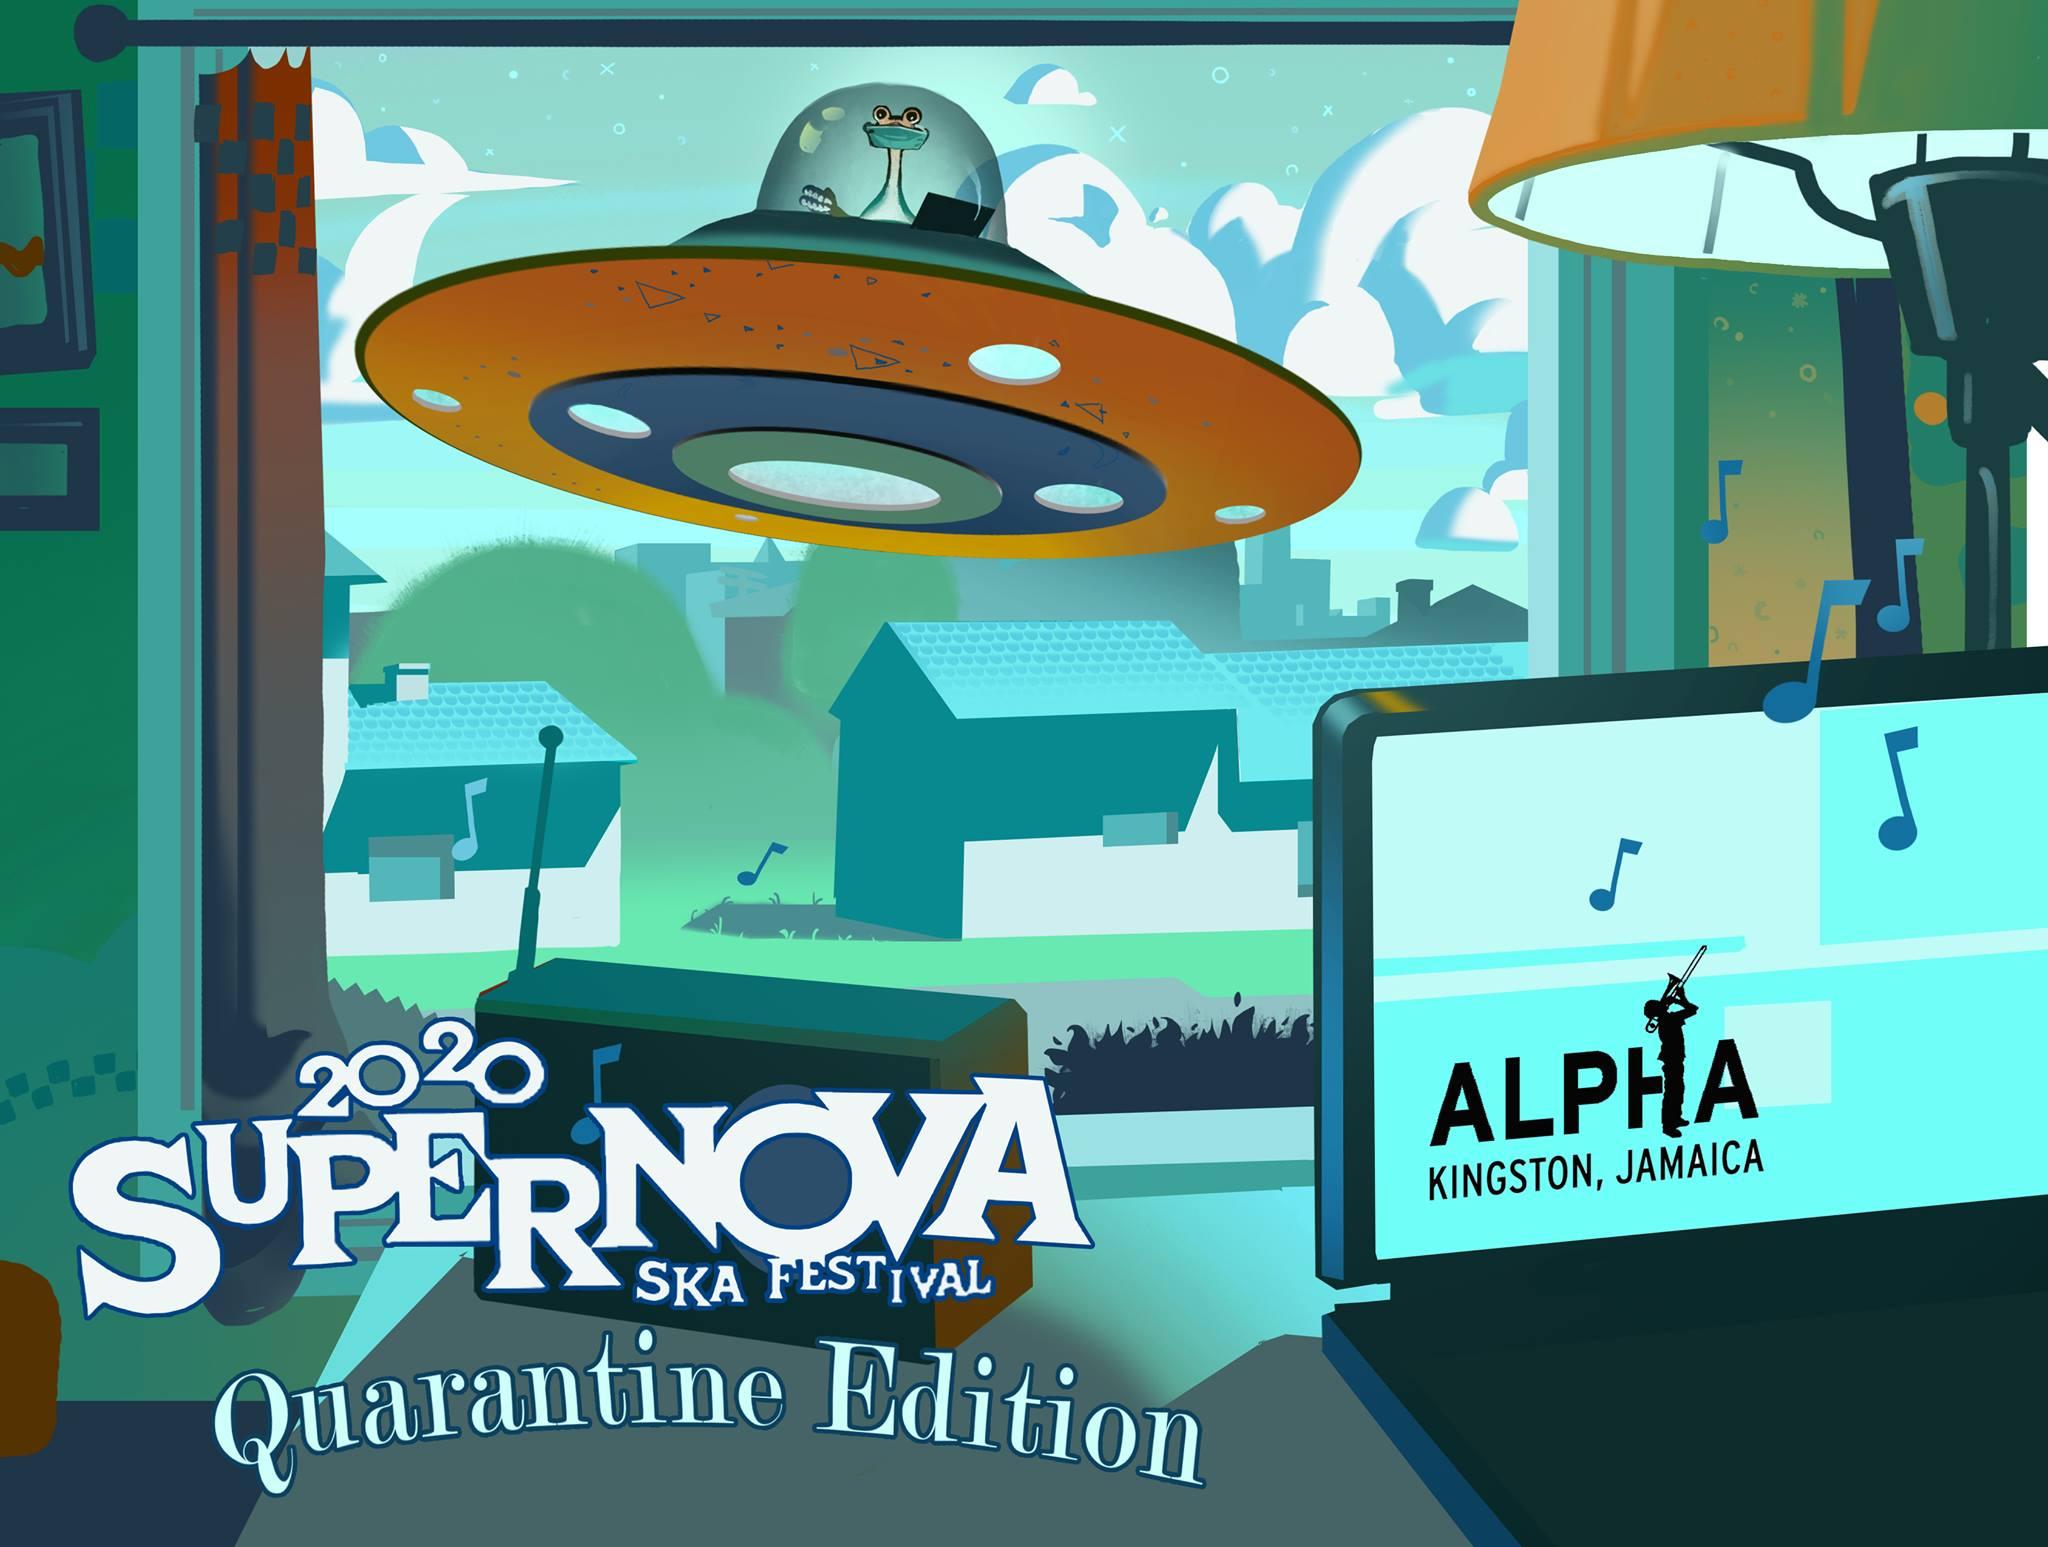 Supernova Ska Festival promo image